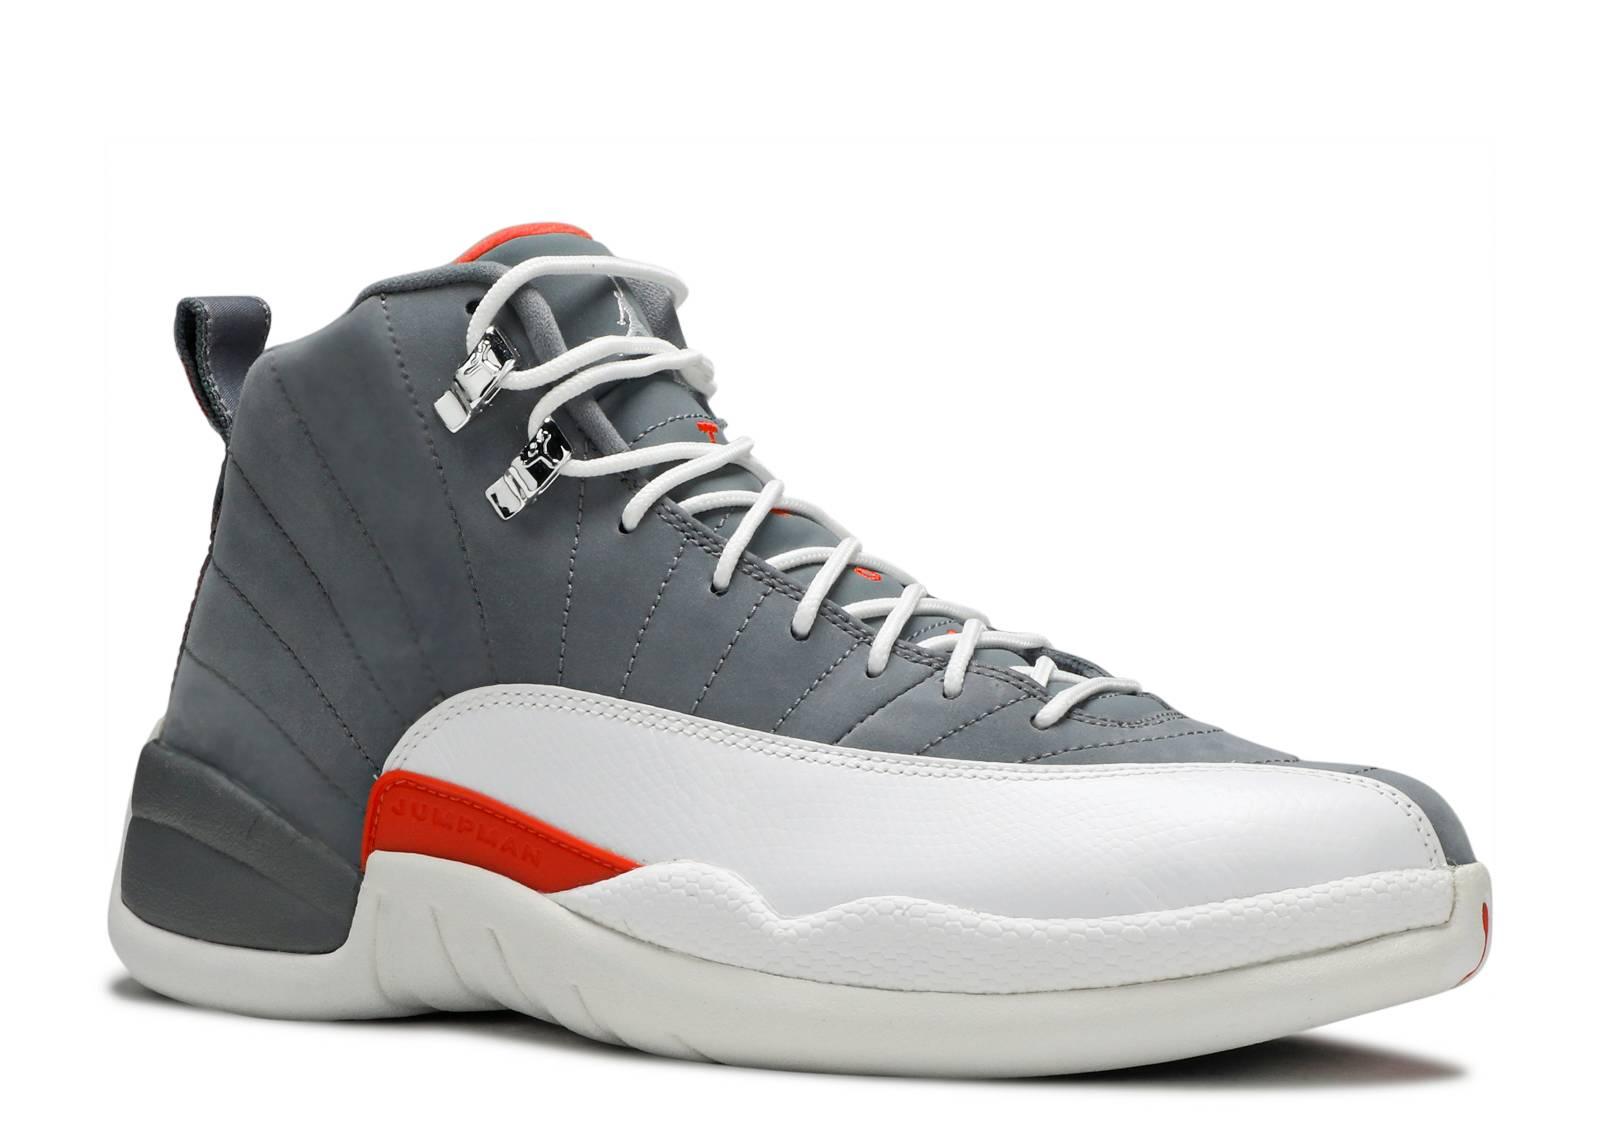 detailed pictures 8217d 3f134 spain jordan 12 cool grey team orange a1786 88e1c